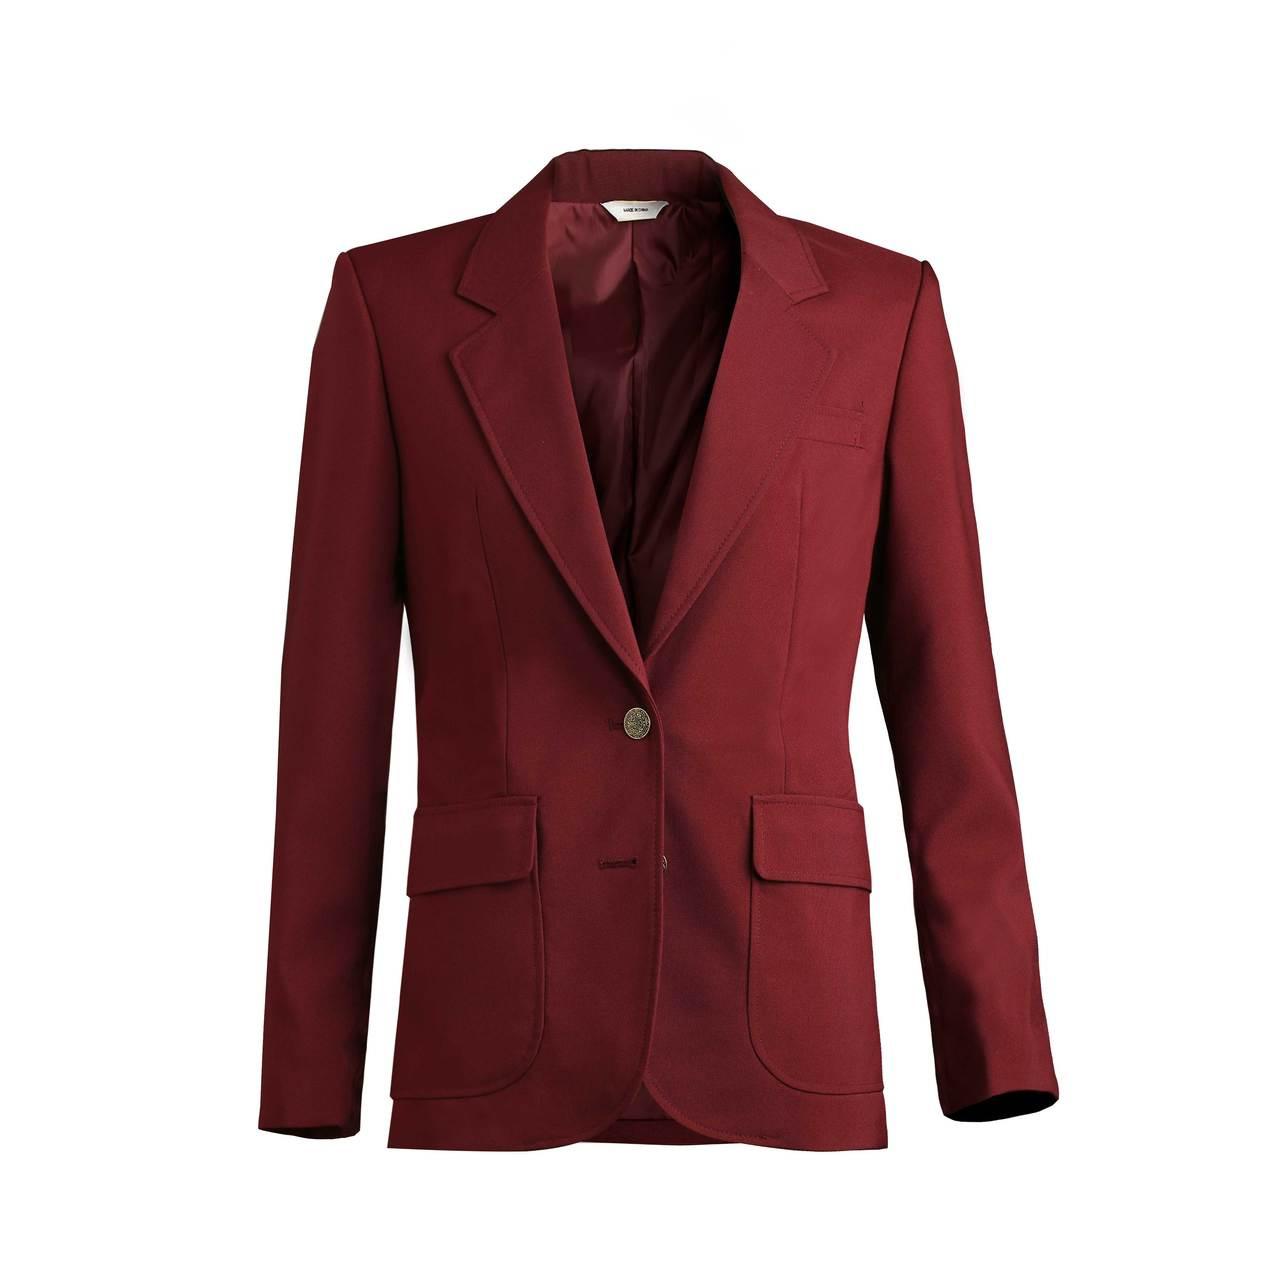 Women's Polyester Blazer